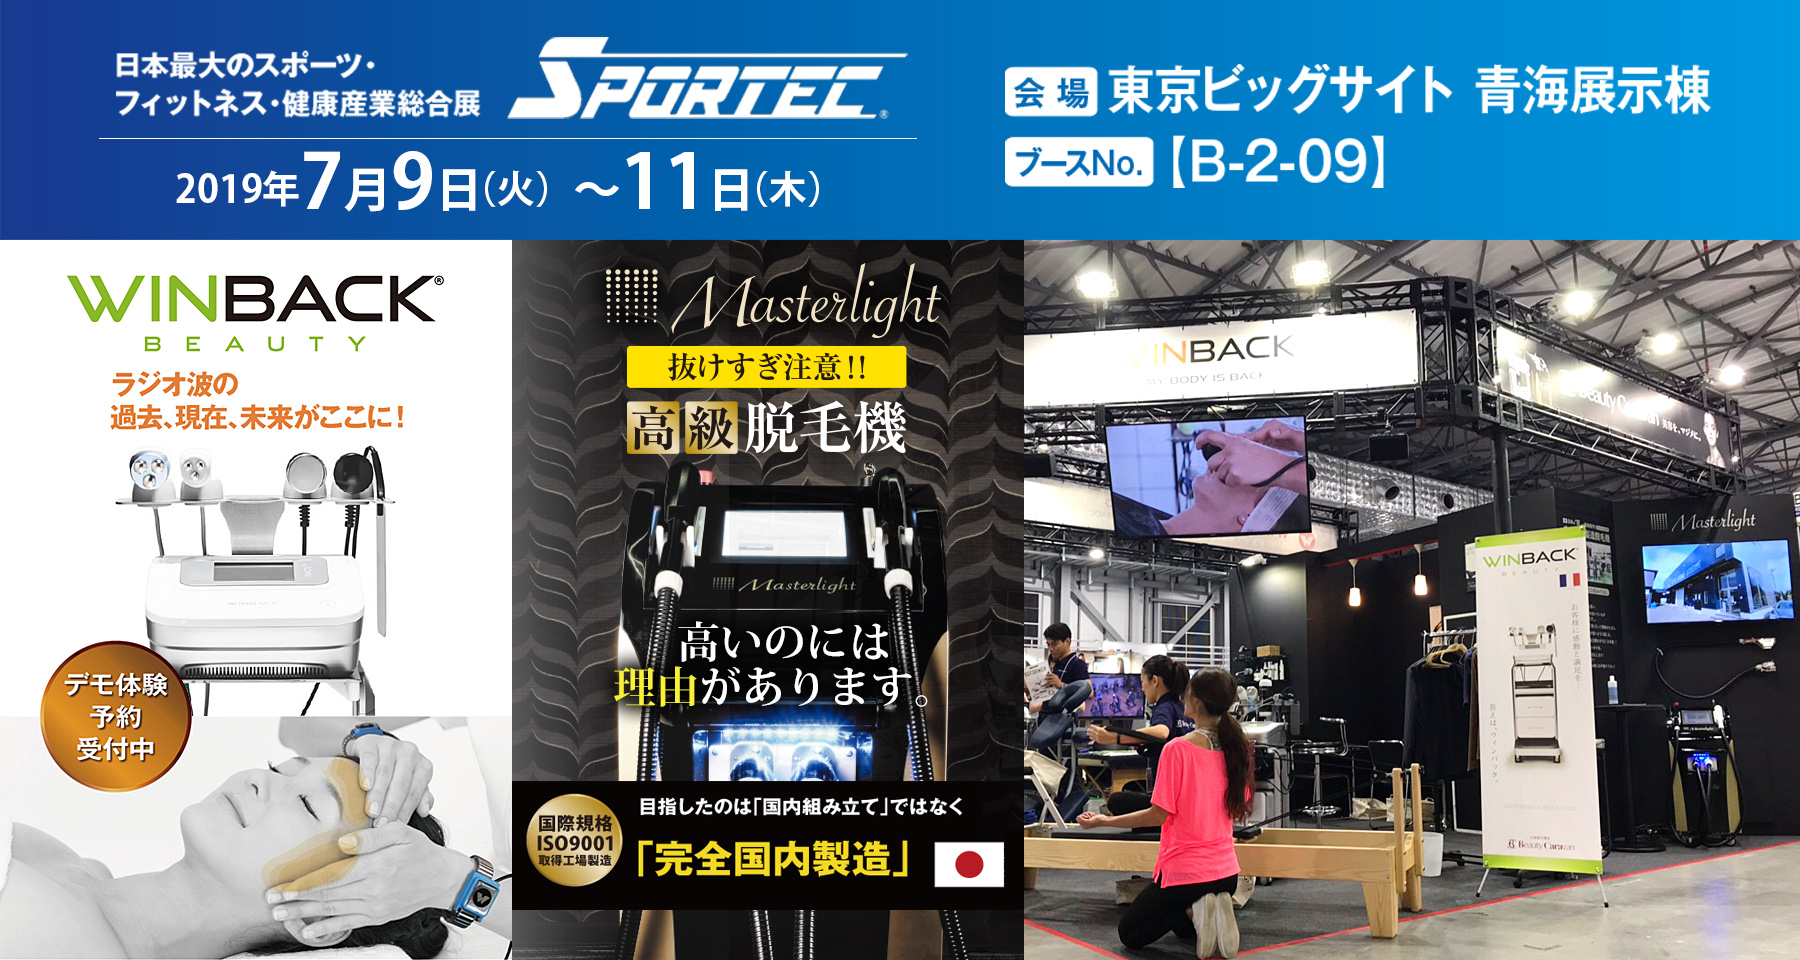 SPORTEC × HEALTH & FITNESS JAPAN フリーハンド施術が可能性を切り開く